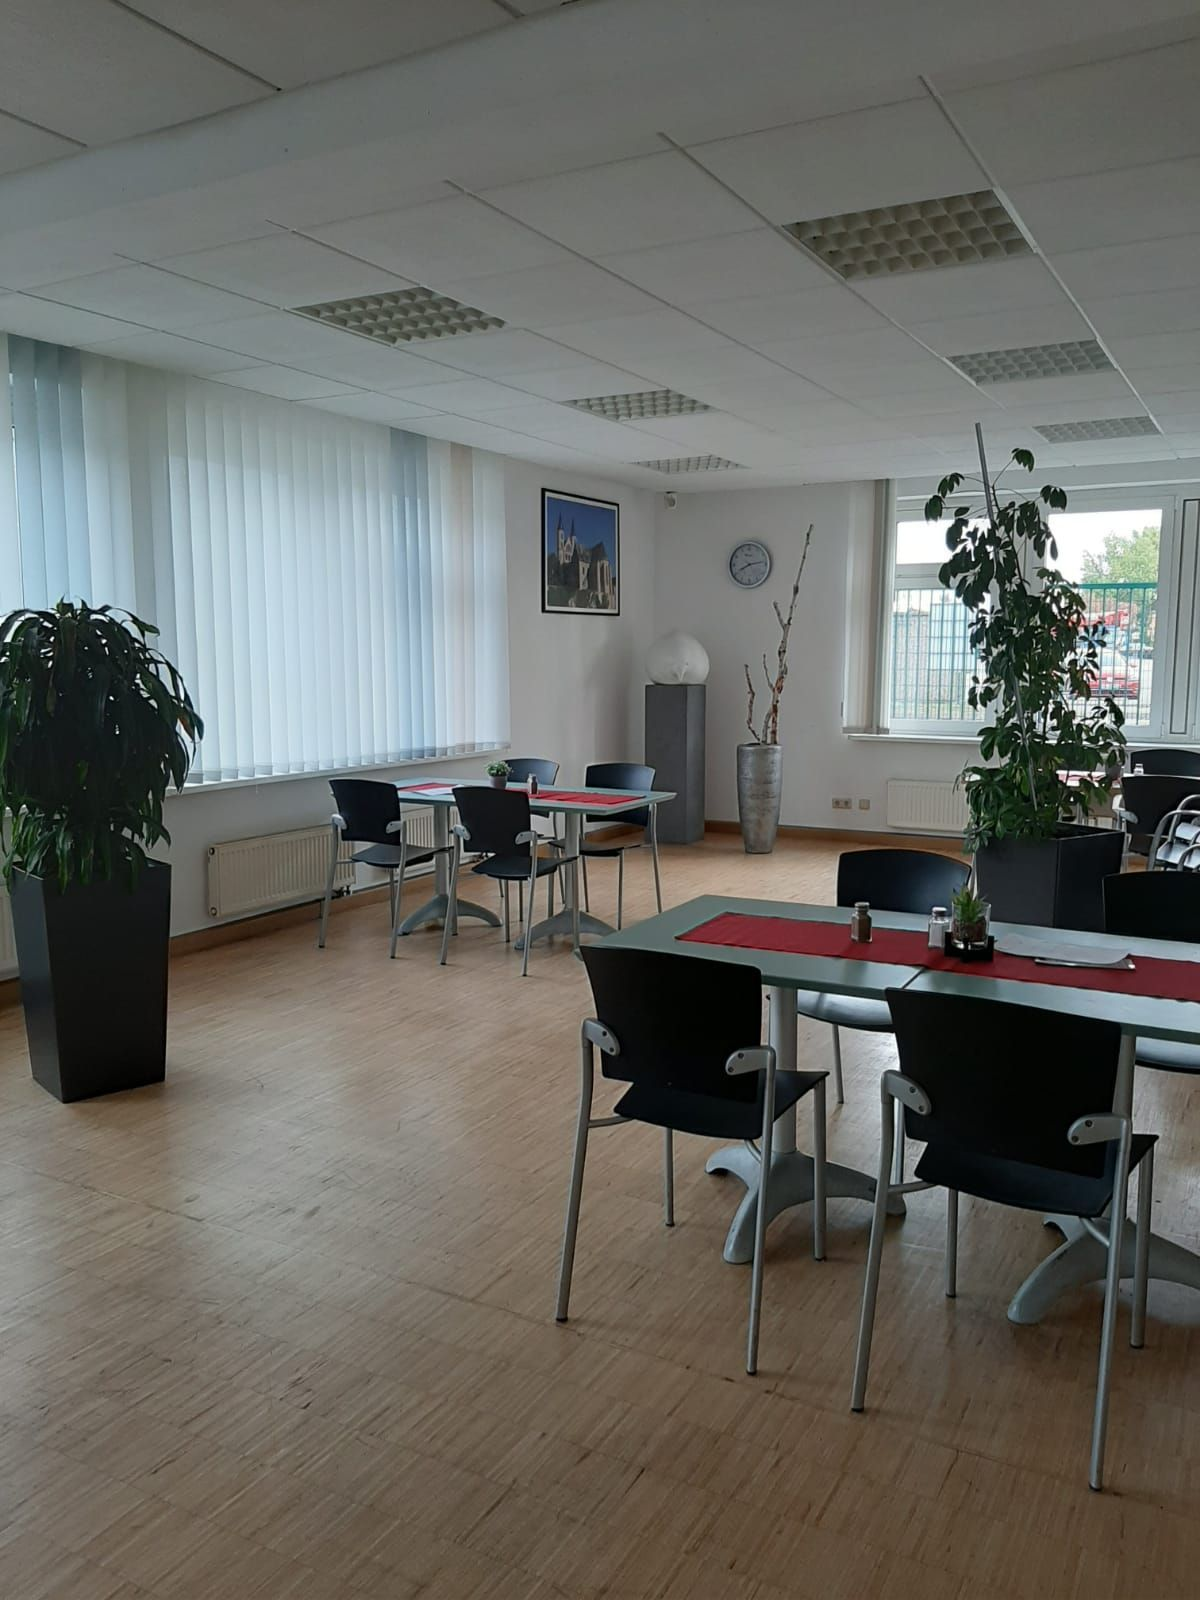 Sporkenbach, Saalestraße 43/44,